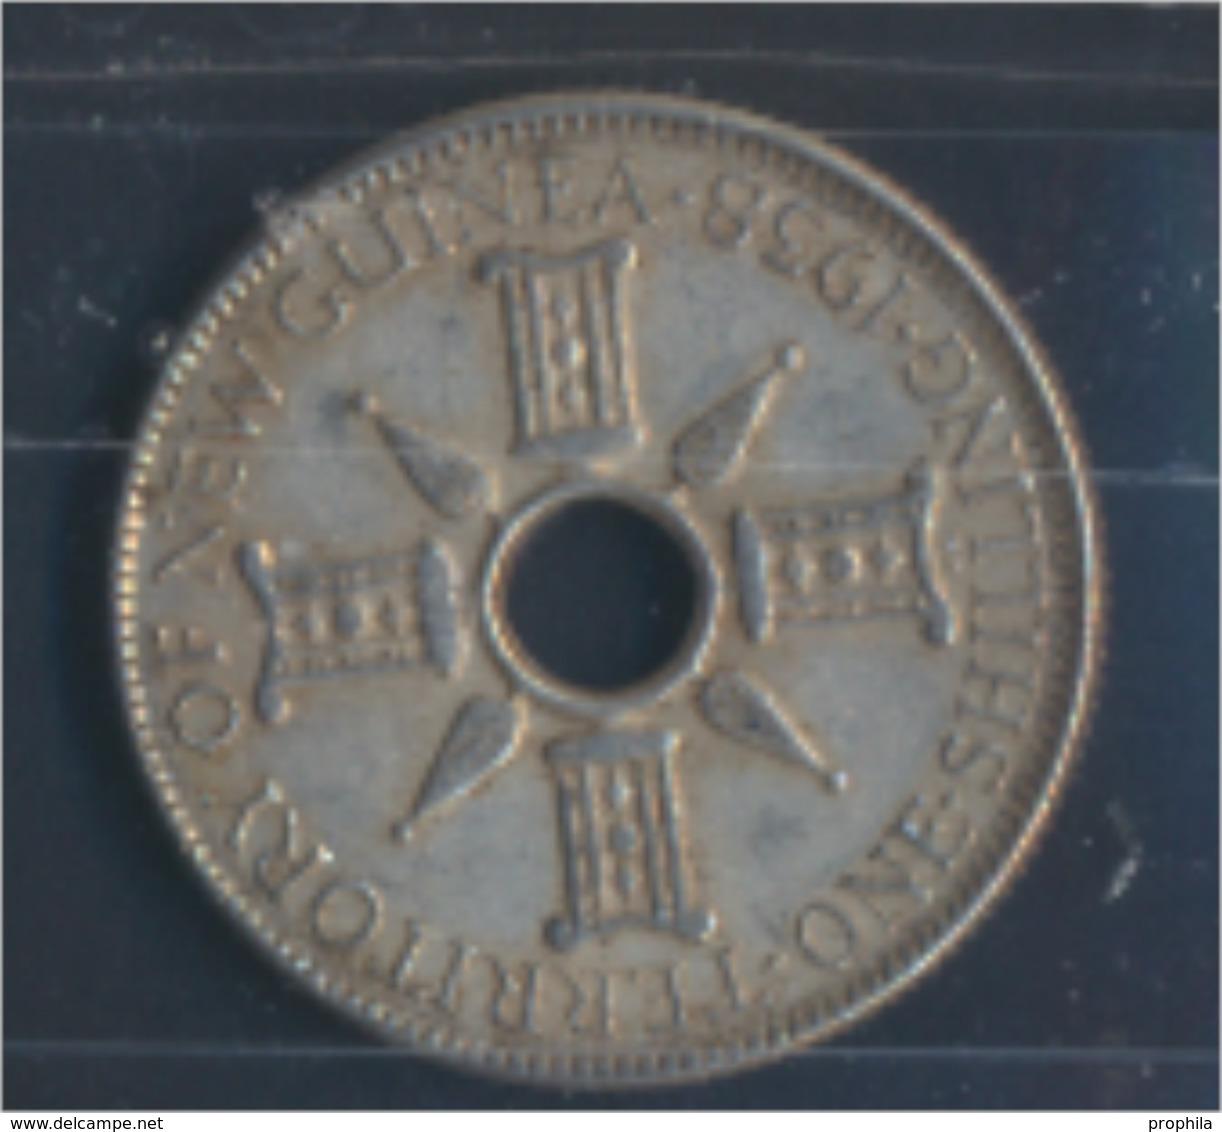 Neuguinea KM-Nr. : 8 1938 Vorzüglich Silber 1938 1 Shilling Zepter (8977157 - Papoea-Nieuw-Guinea